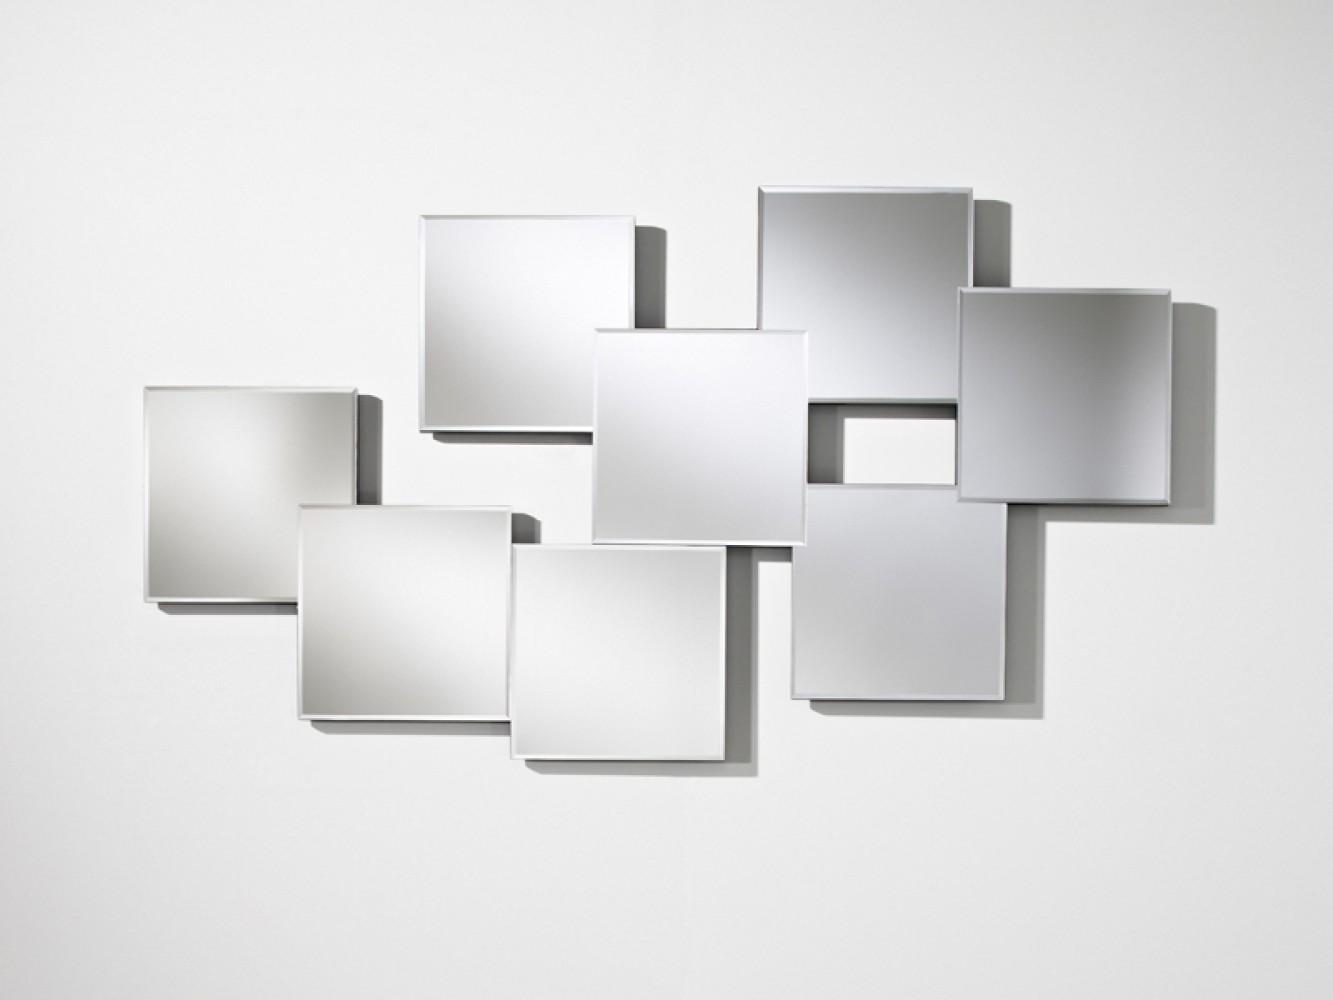 Miroir Memo 144x80 cm